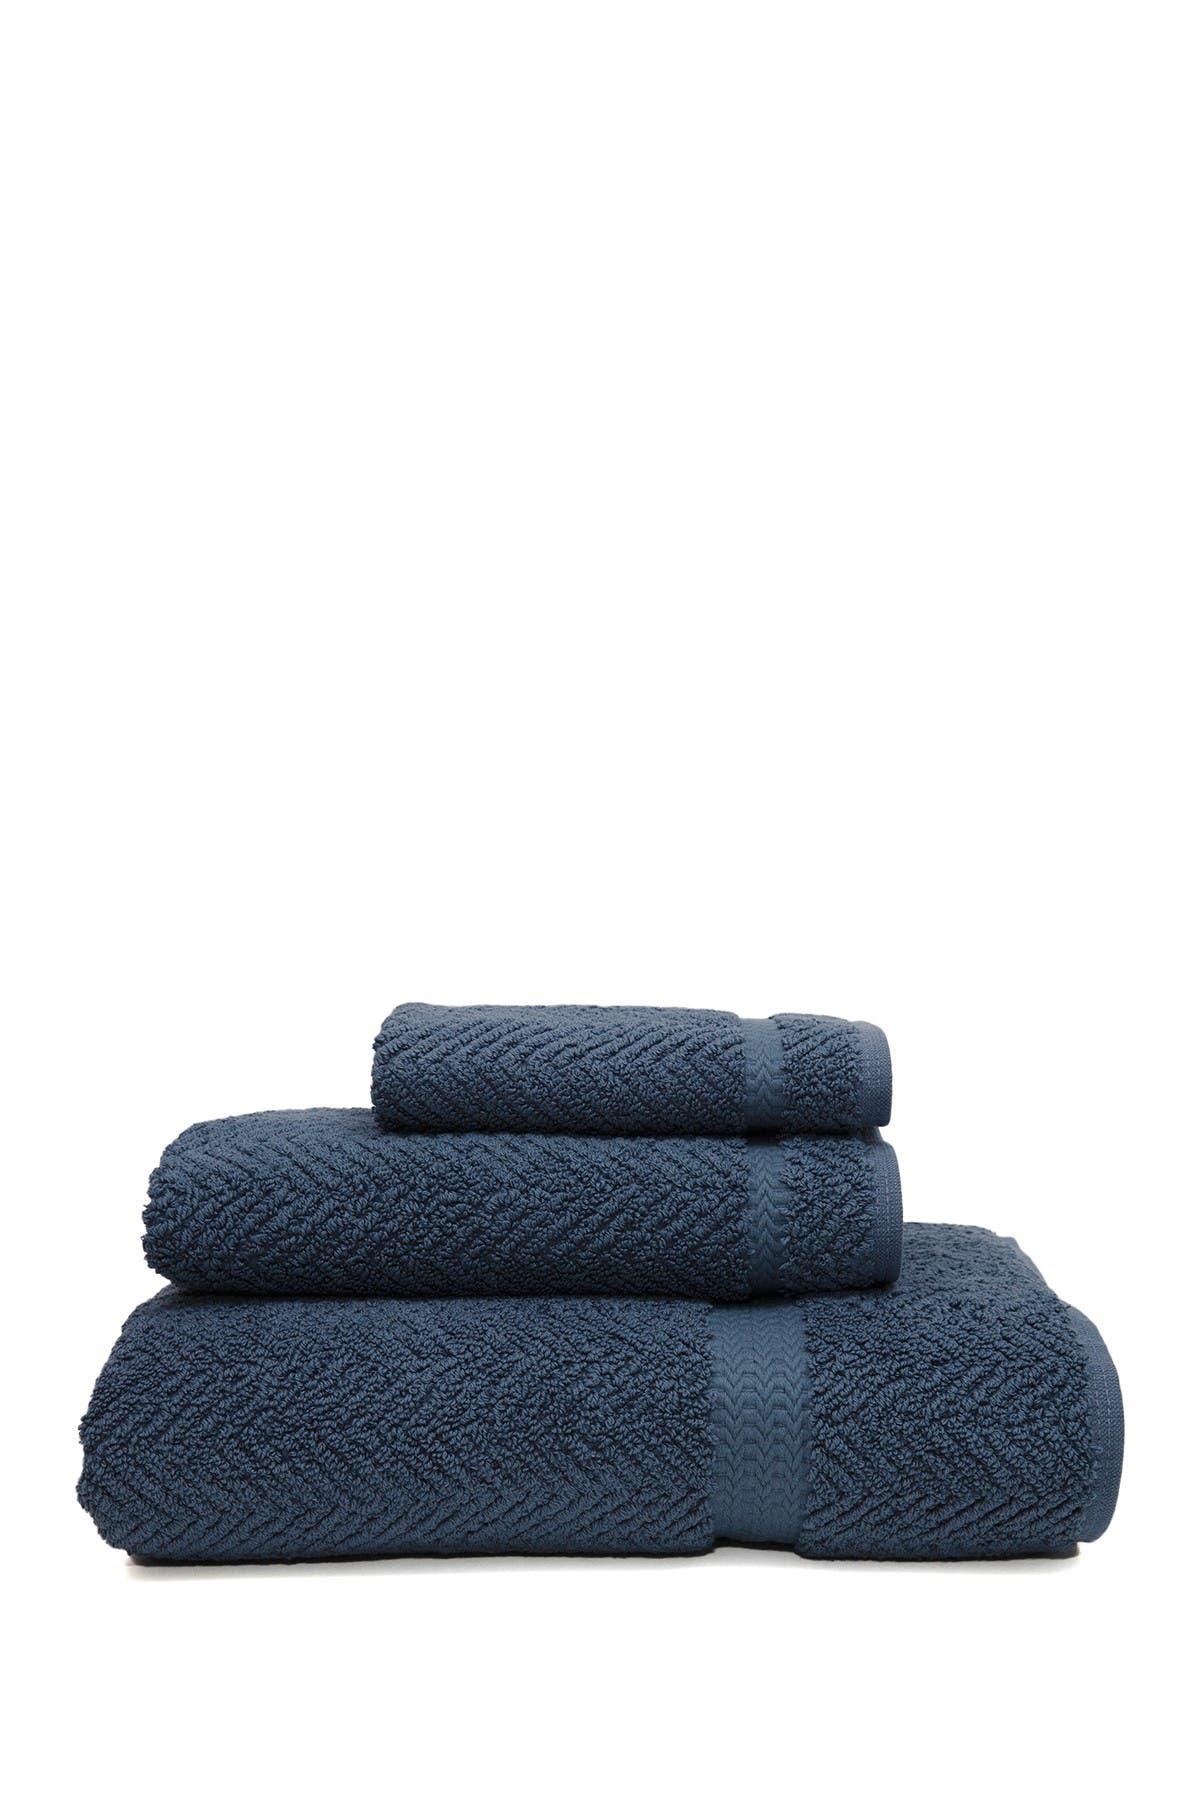 Linum Home Midnight Blue Herringbone 3 Piece Towel Set Nordstrom Rack